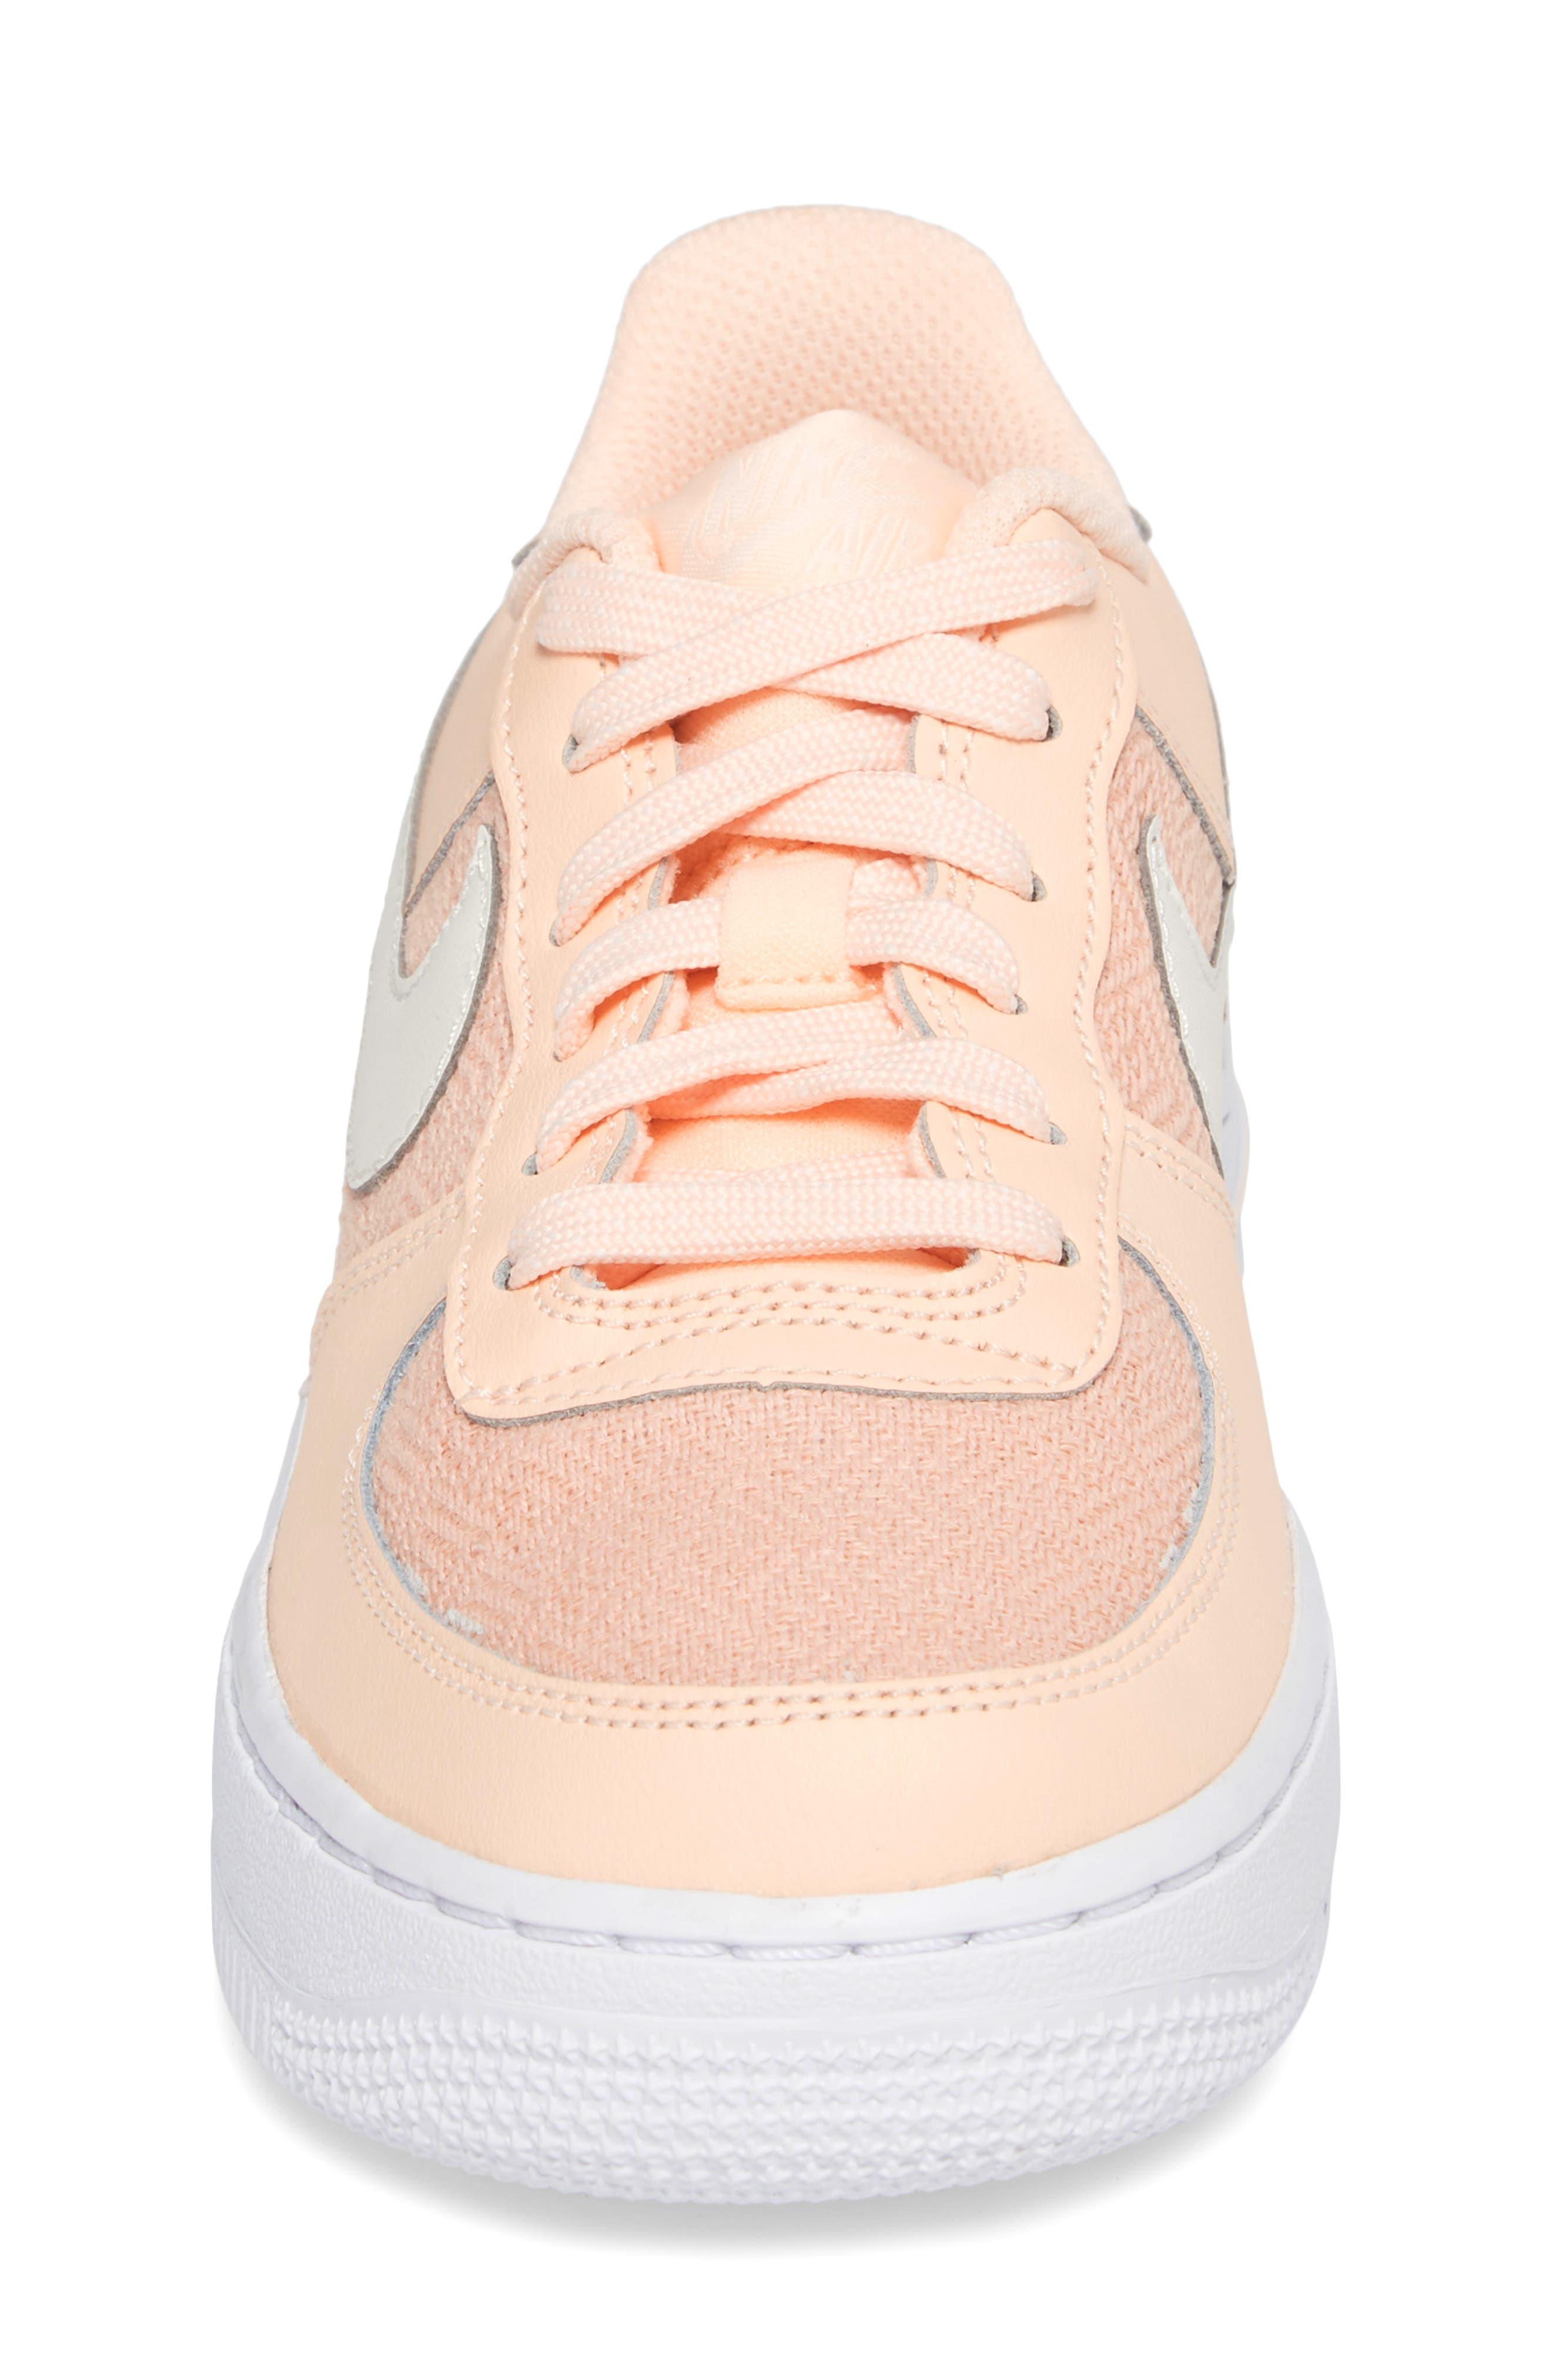 Air Force 1 LV8 Sneaker,                             Alternate thumbnail 18, color,